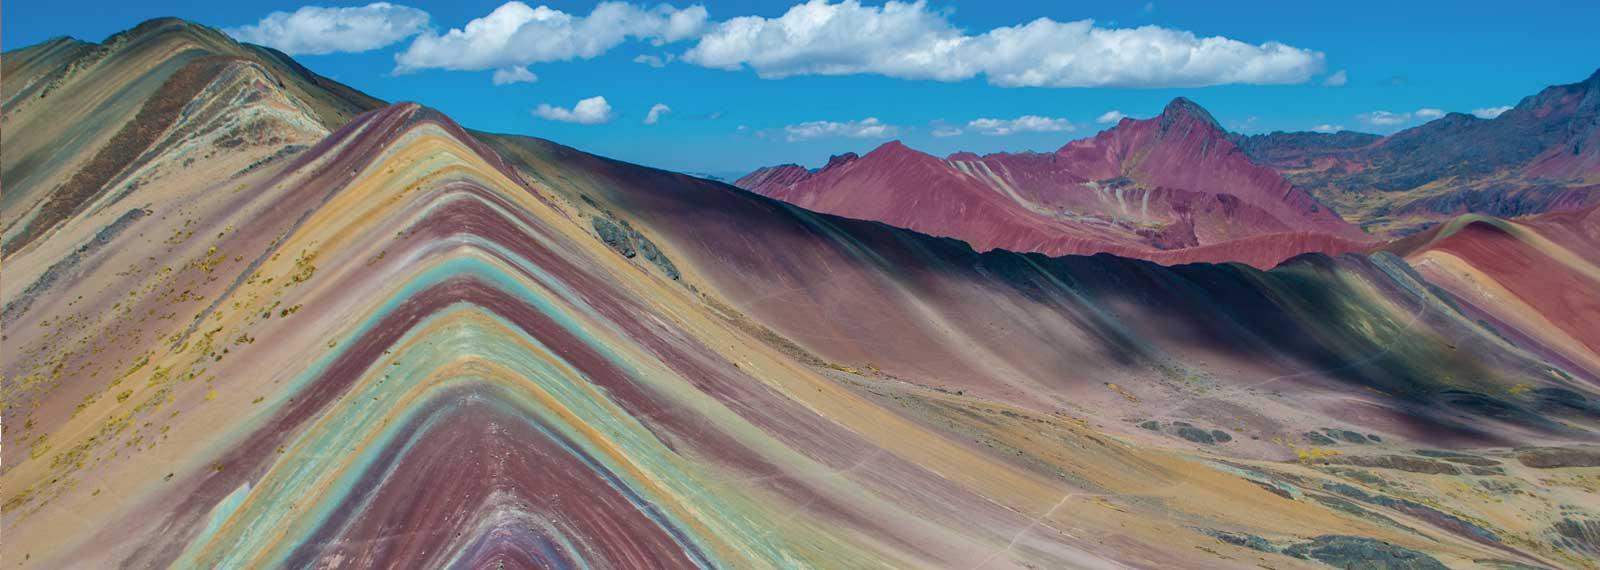 palcoyoc mountain